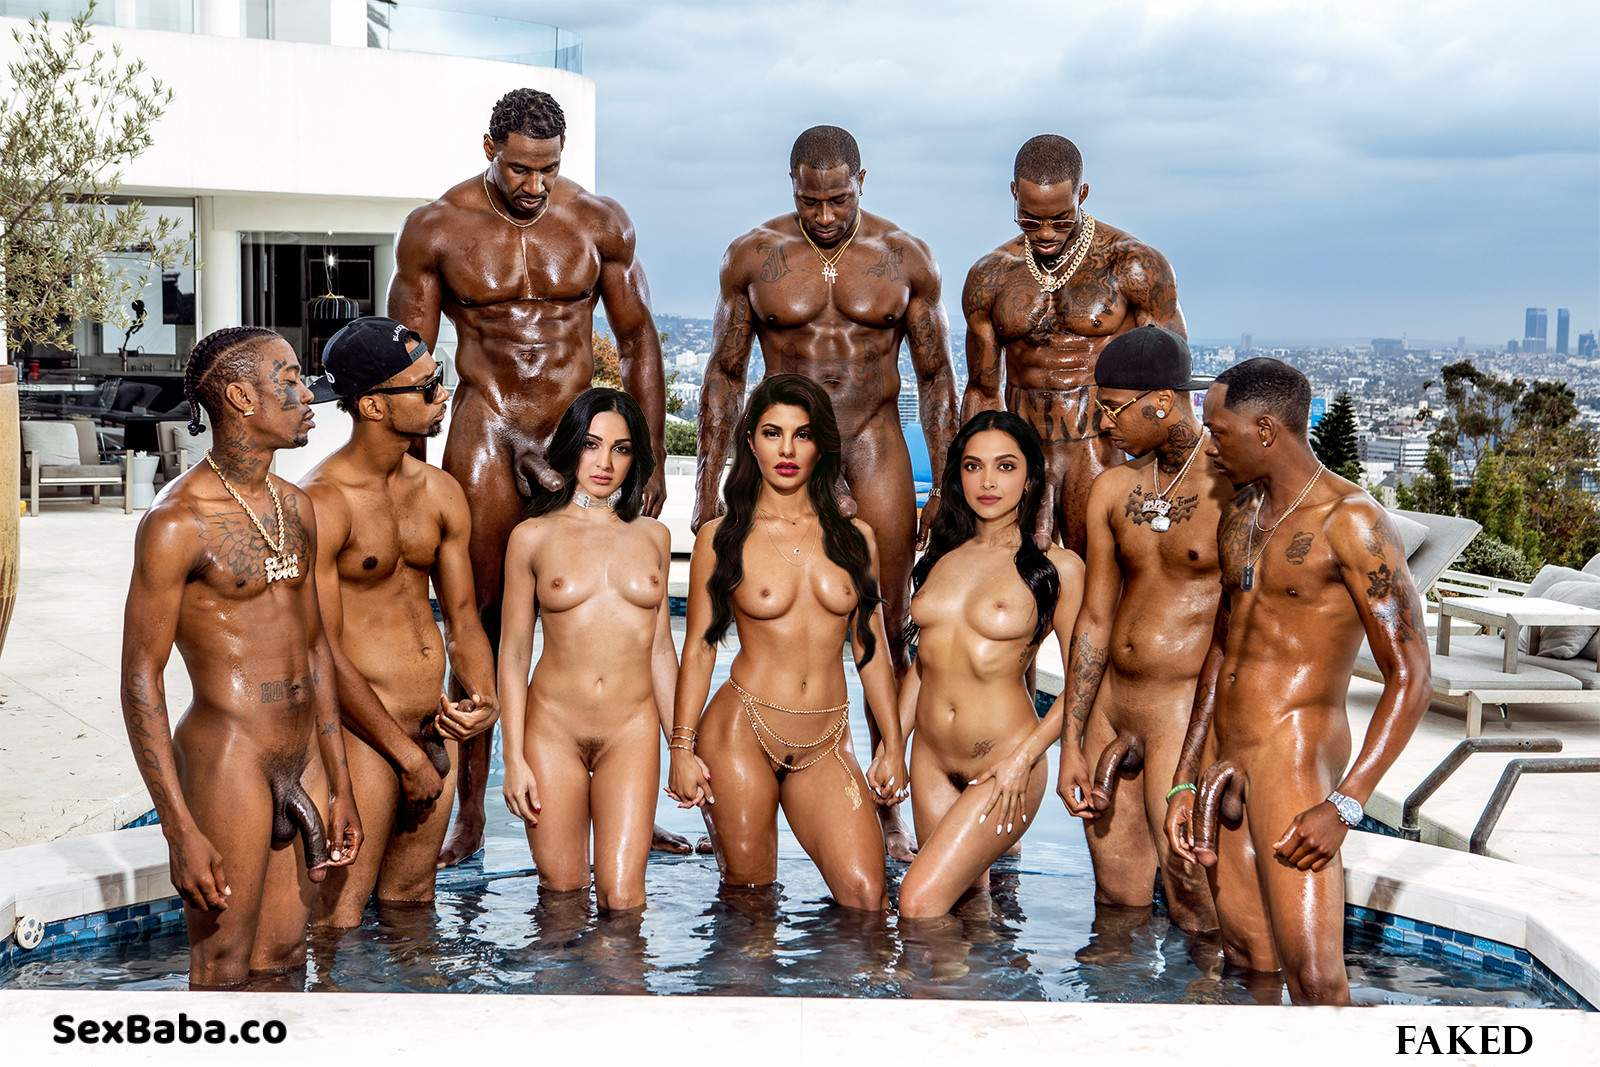 Kiara, Jacky and Deepika Fake nude Photo